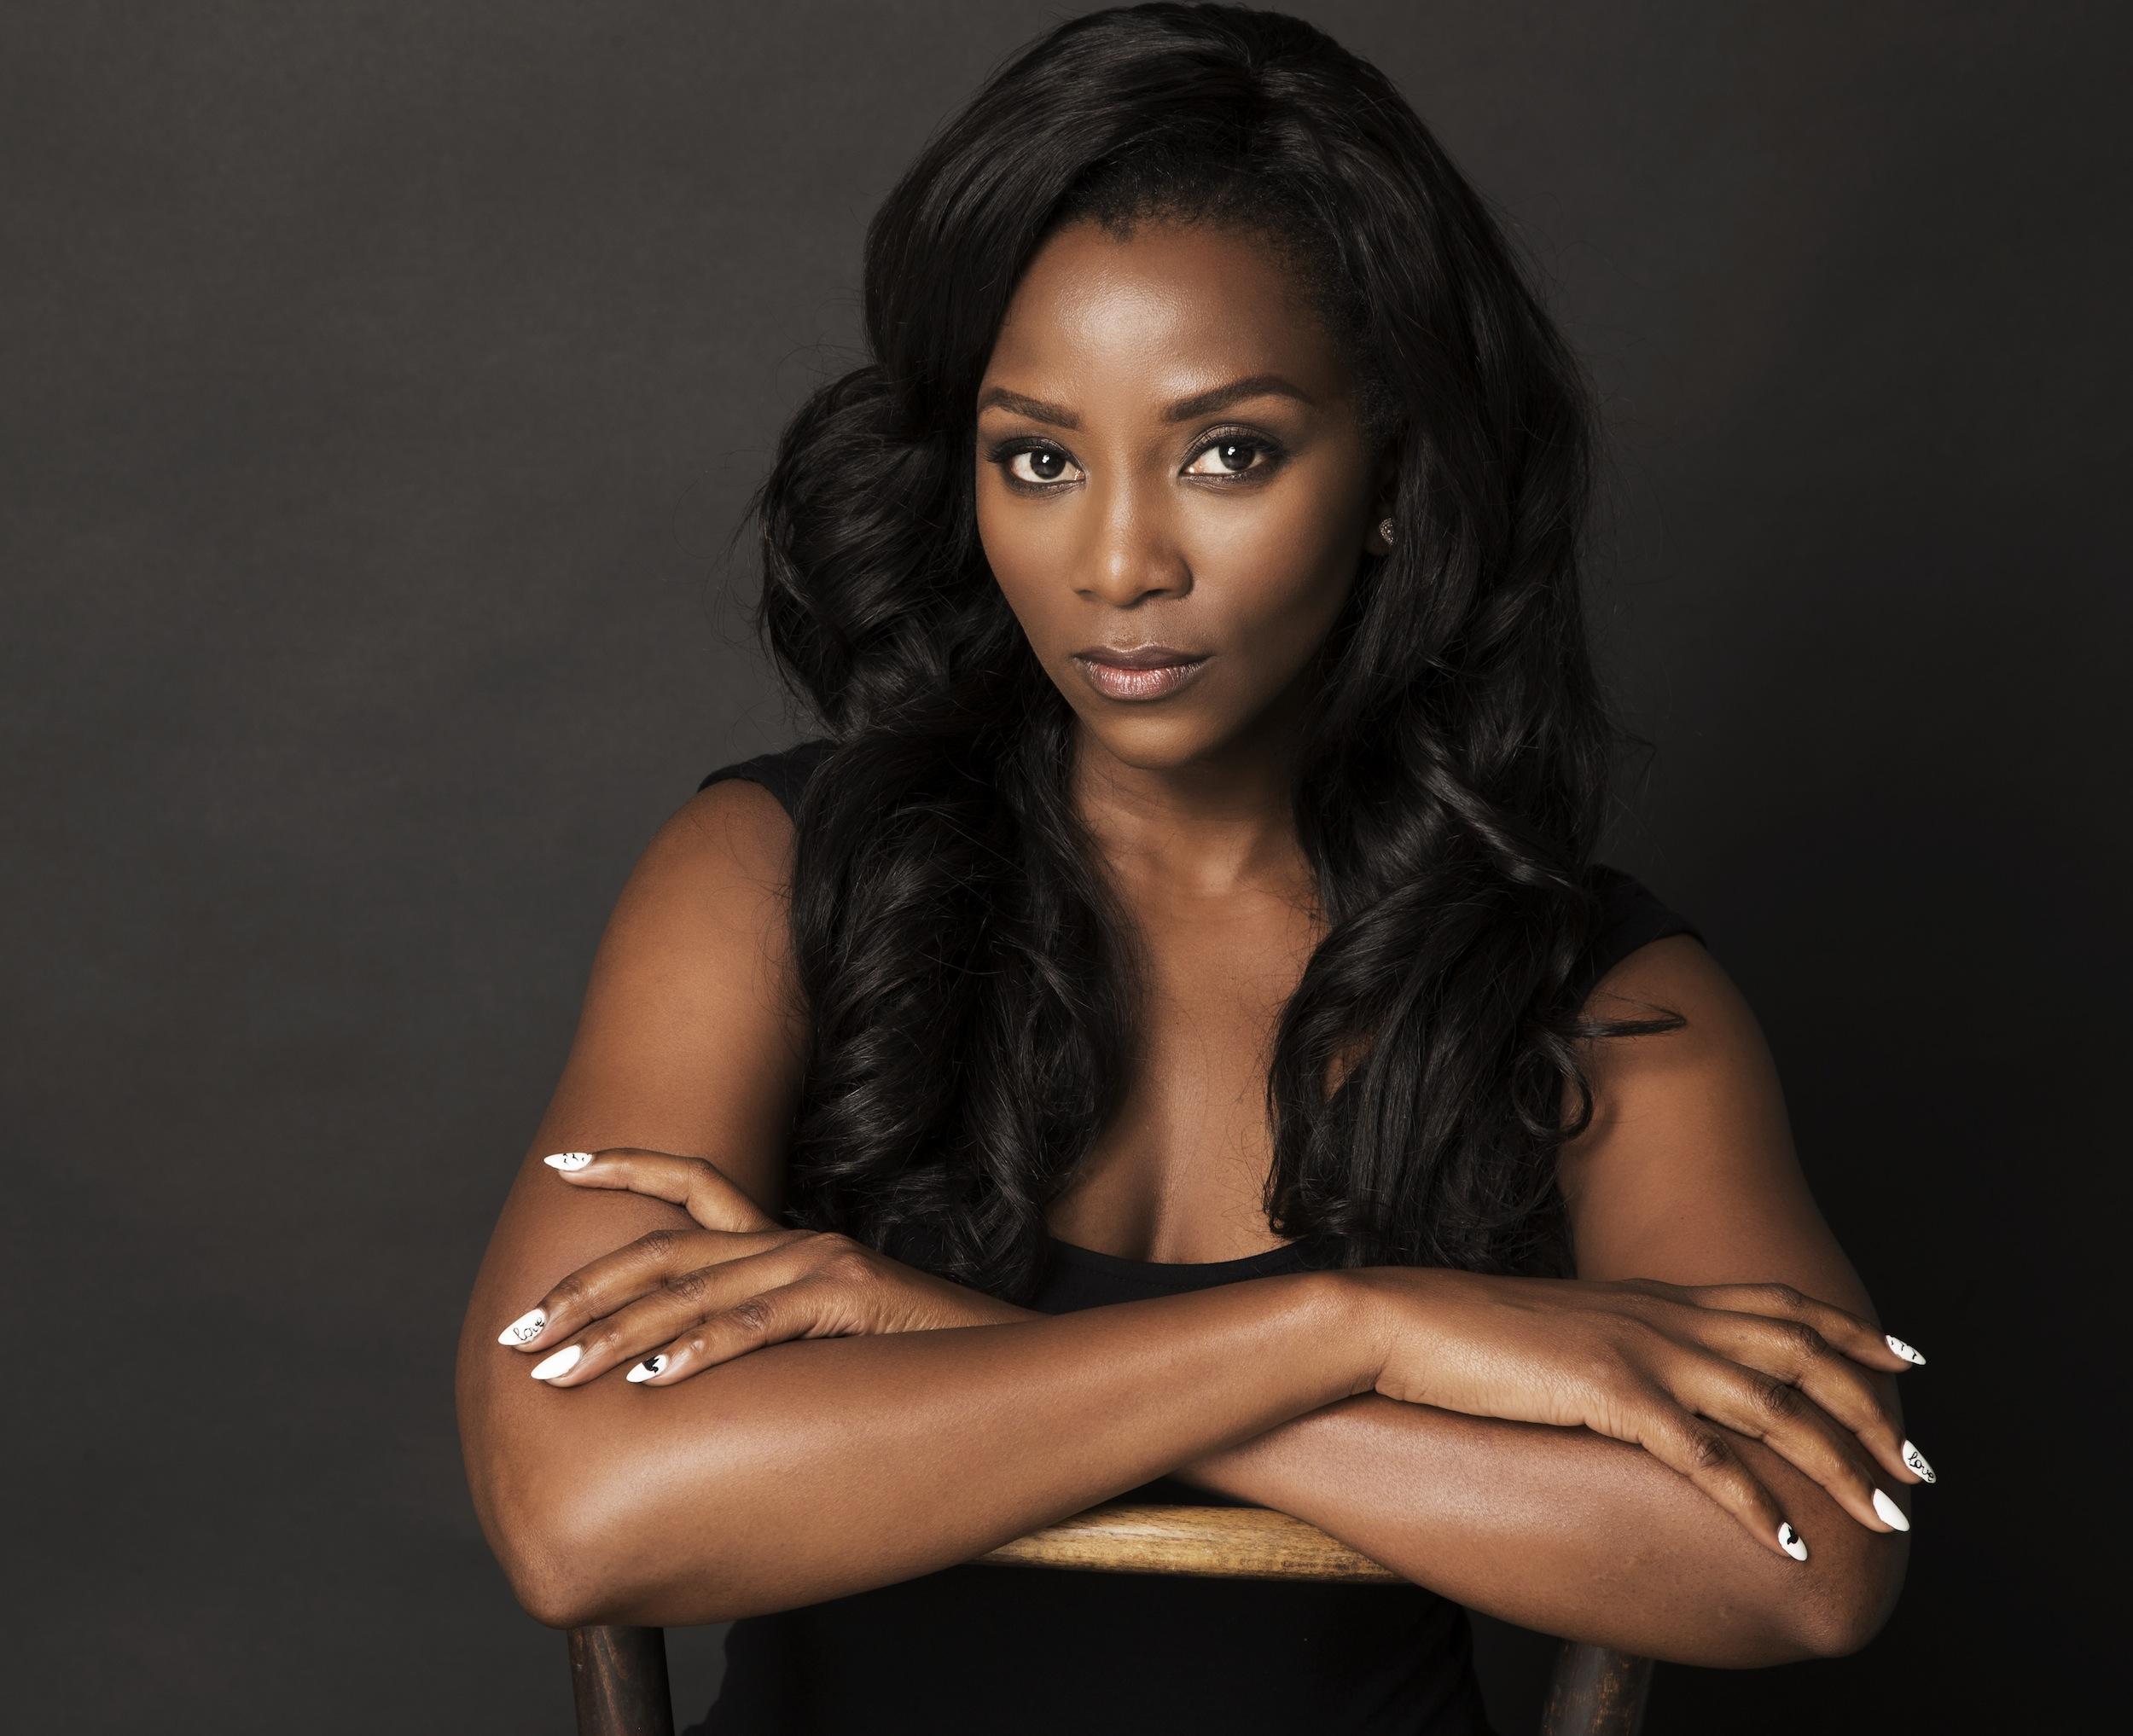 Nollywood celebrity genevieve nnaji fucked